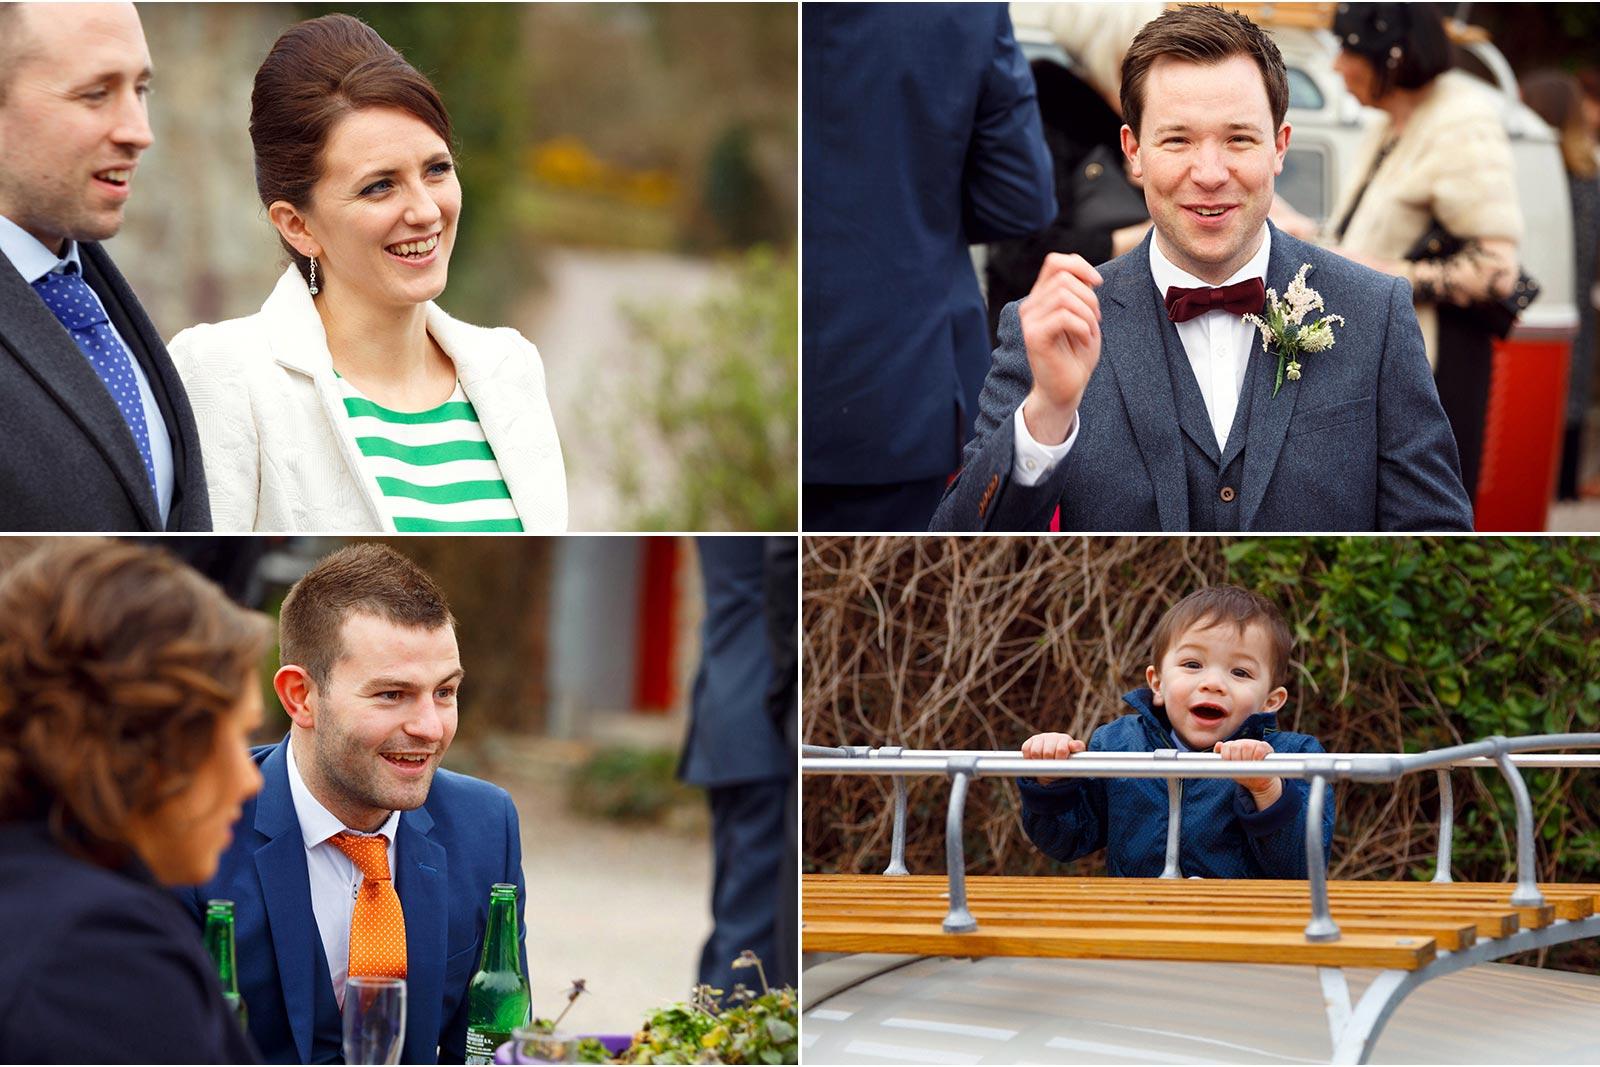 candid wedding guest photos